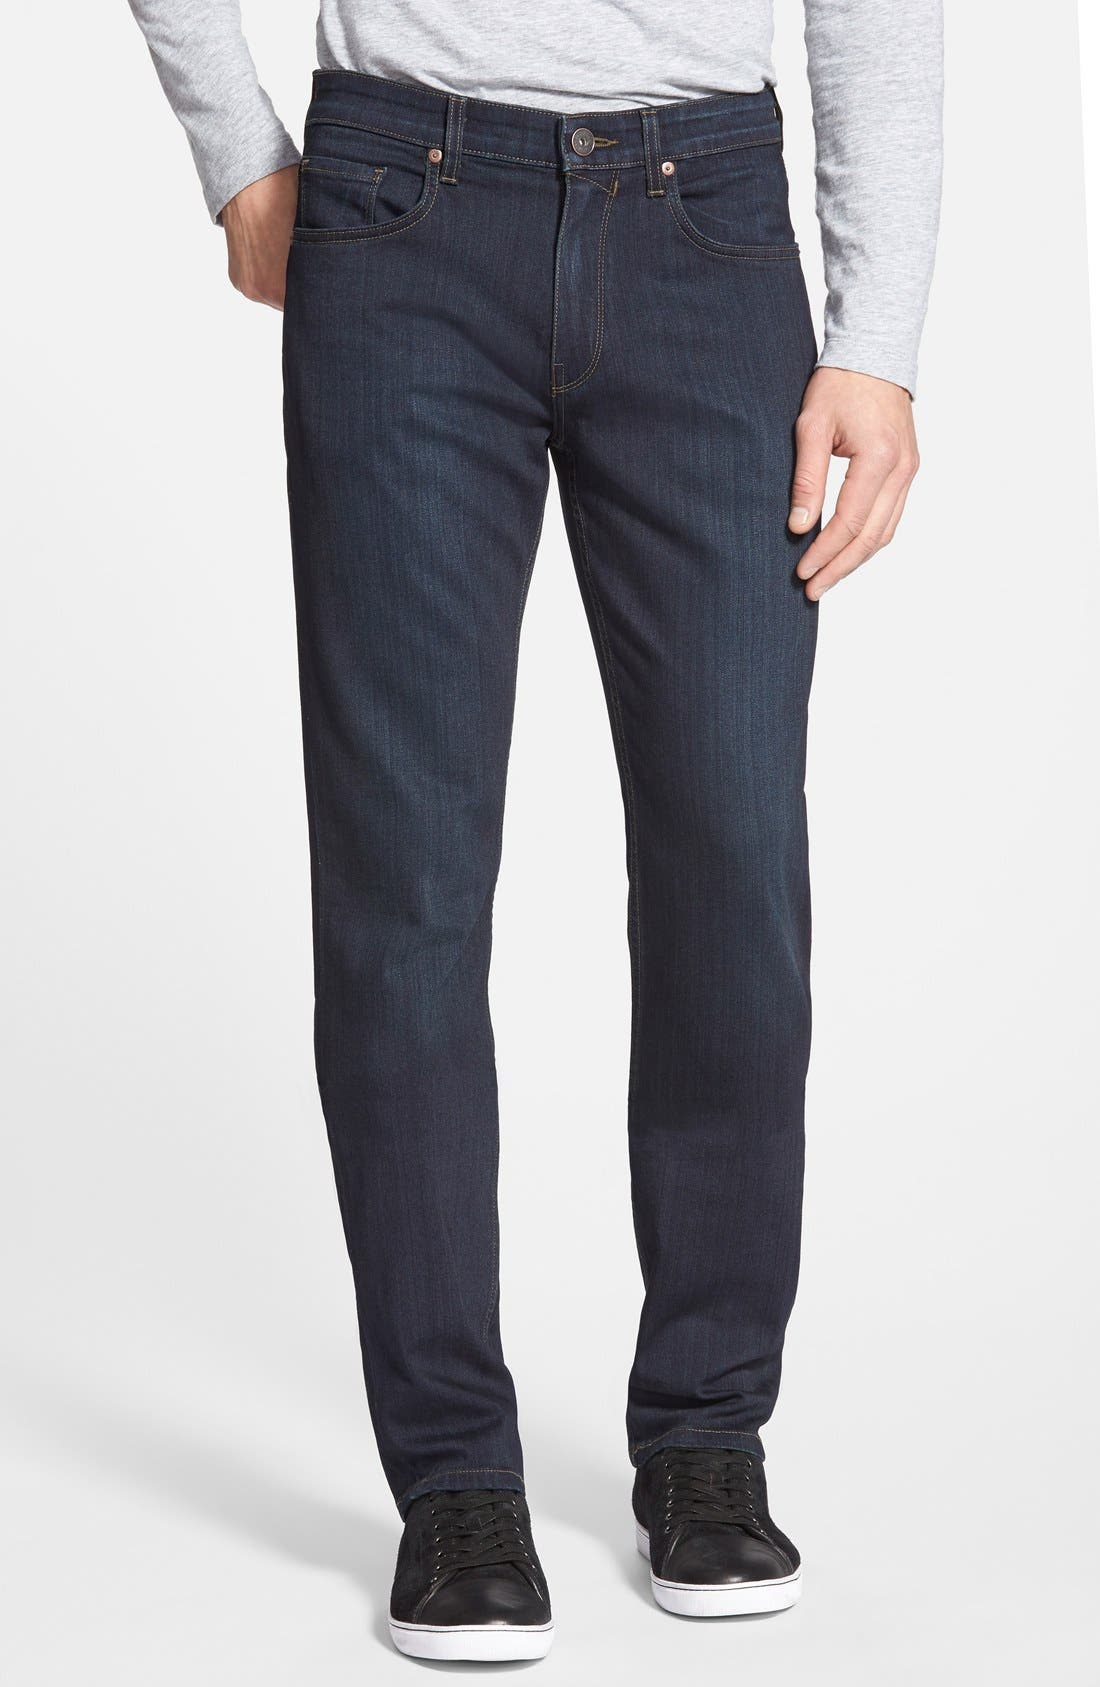 PAIGE,                             Transcend - Federal XL Slim Straight Leg Jeans,                             Main thumbnail 1, color,                             CELLAR/ CELLAR